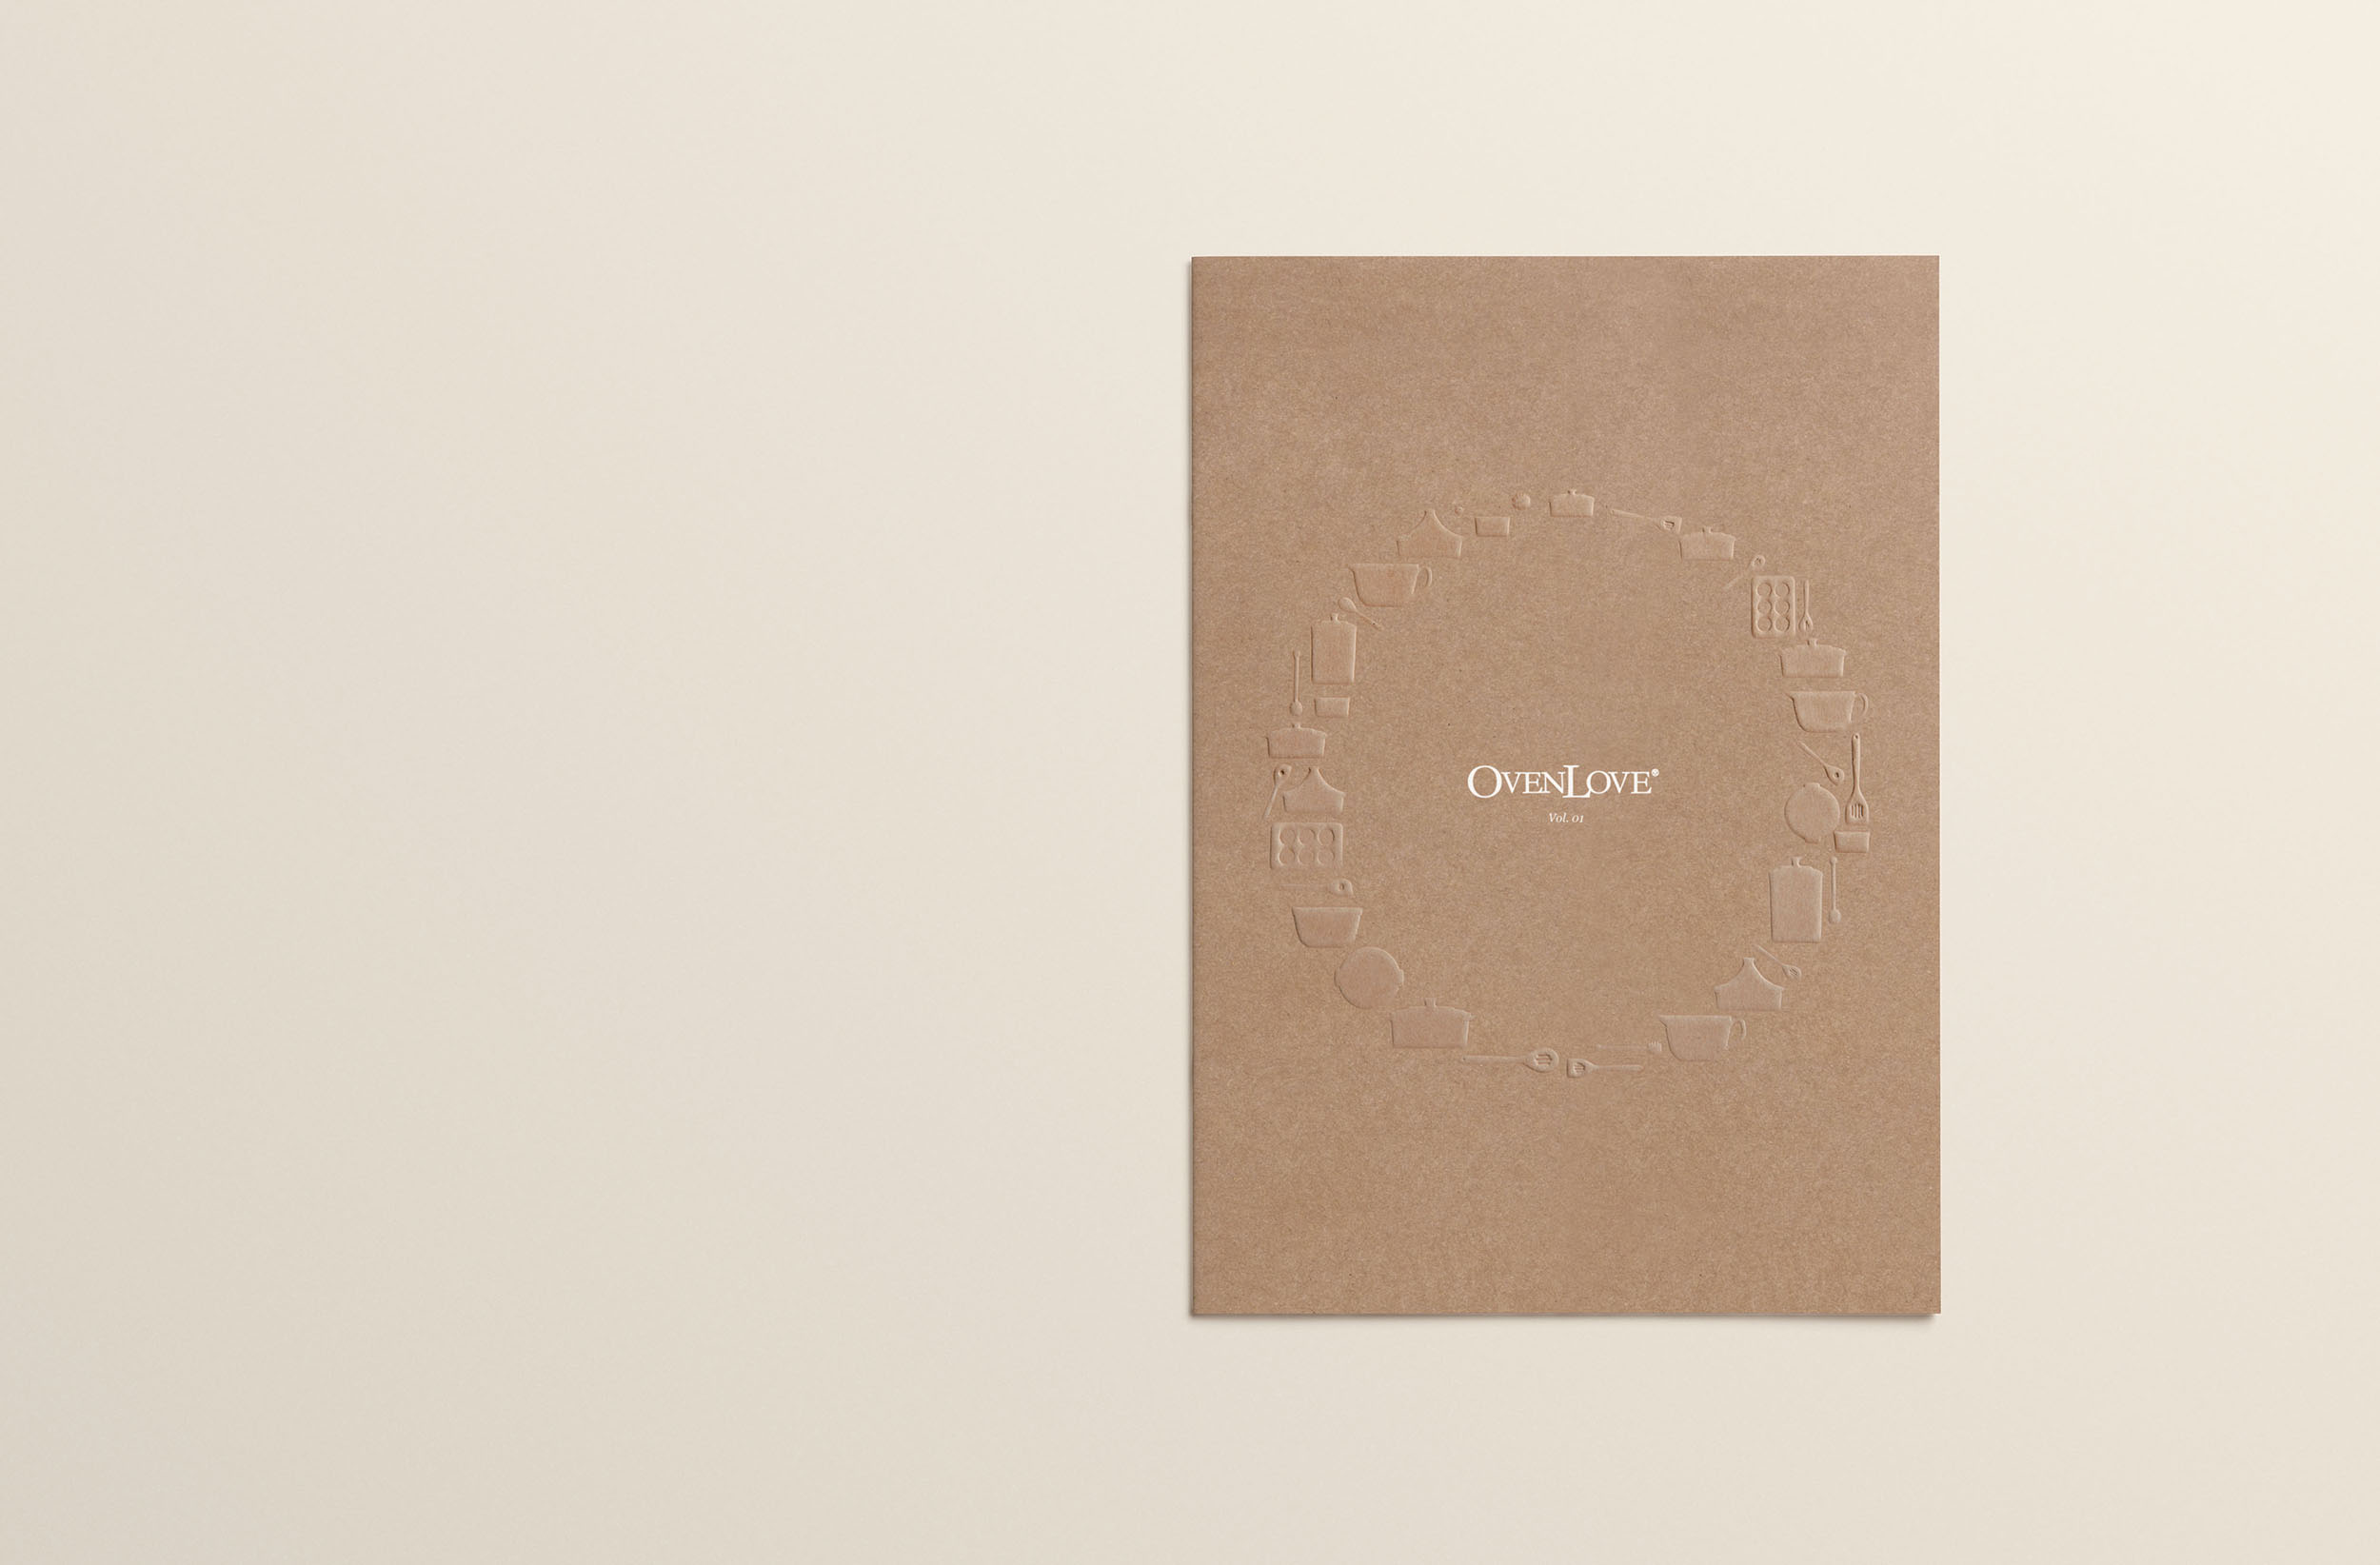 ovenlove catalogue cover